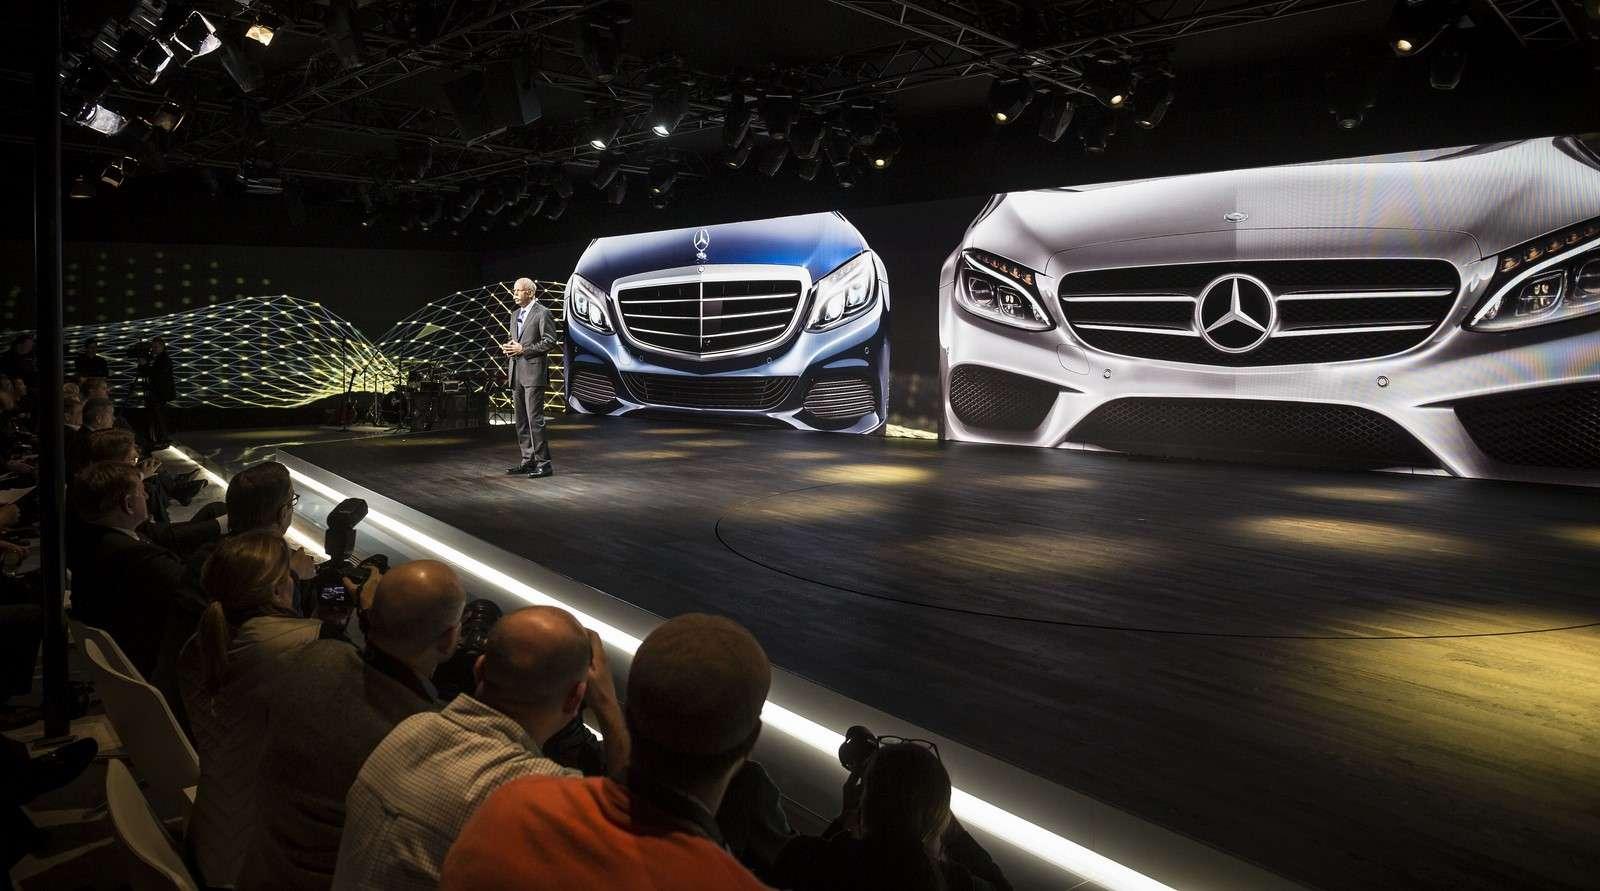 Mercedes Benz C-Class 2015 Live Photos from Detroit 2014